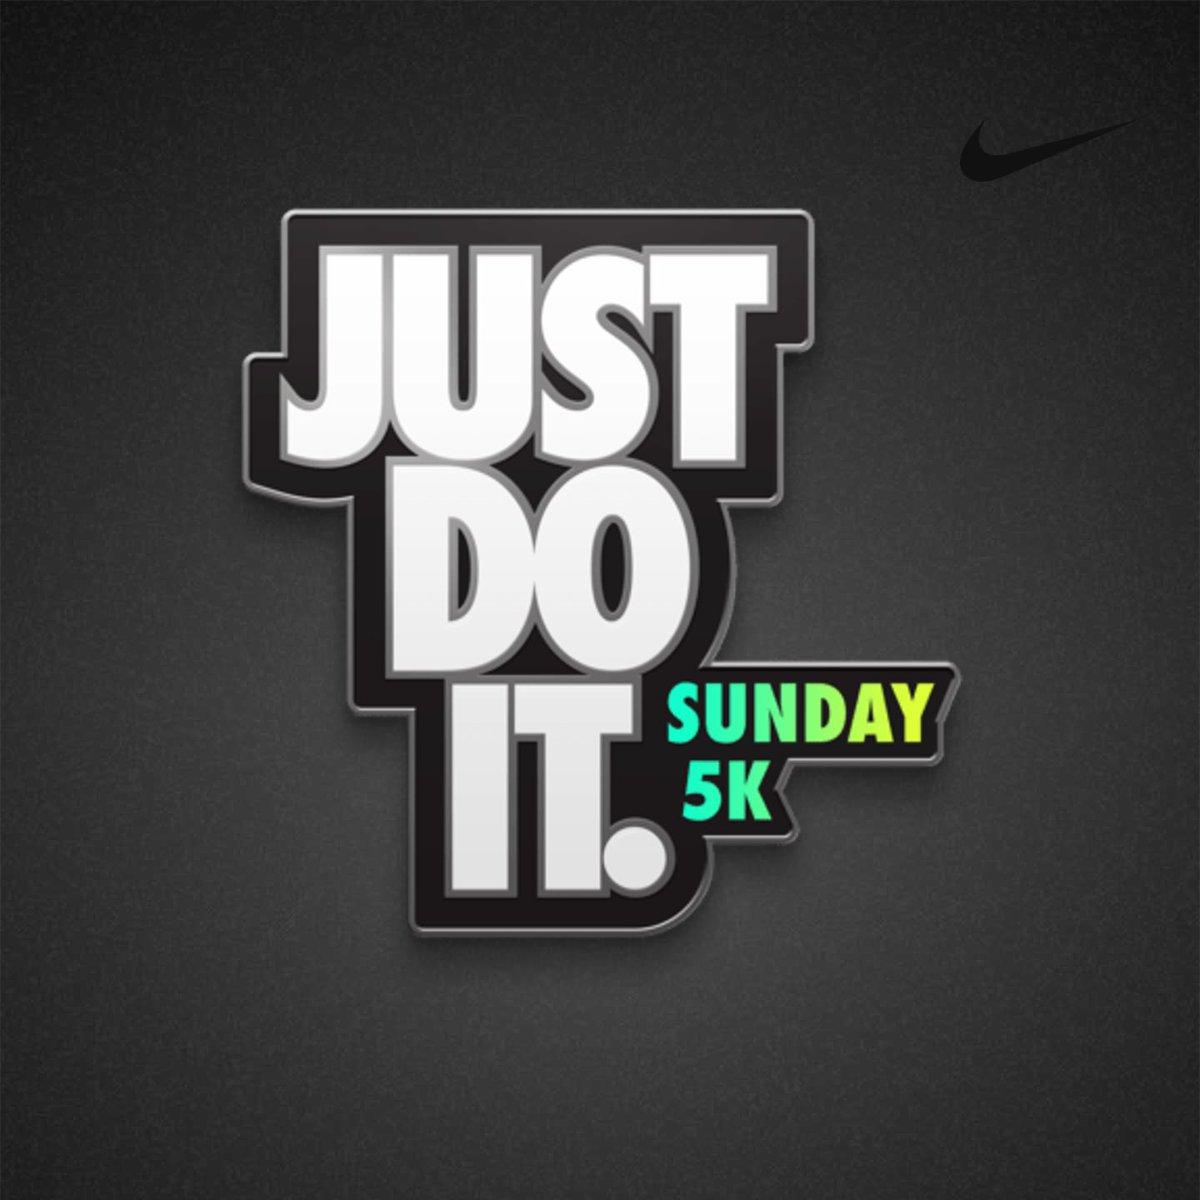 I just ran on Sunday with Nike Run Club. #movewithhart #hustlehart #moonshot @NikeService